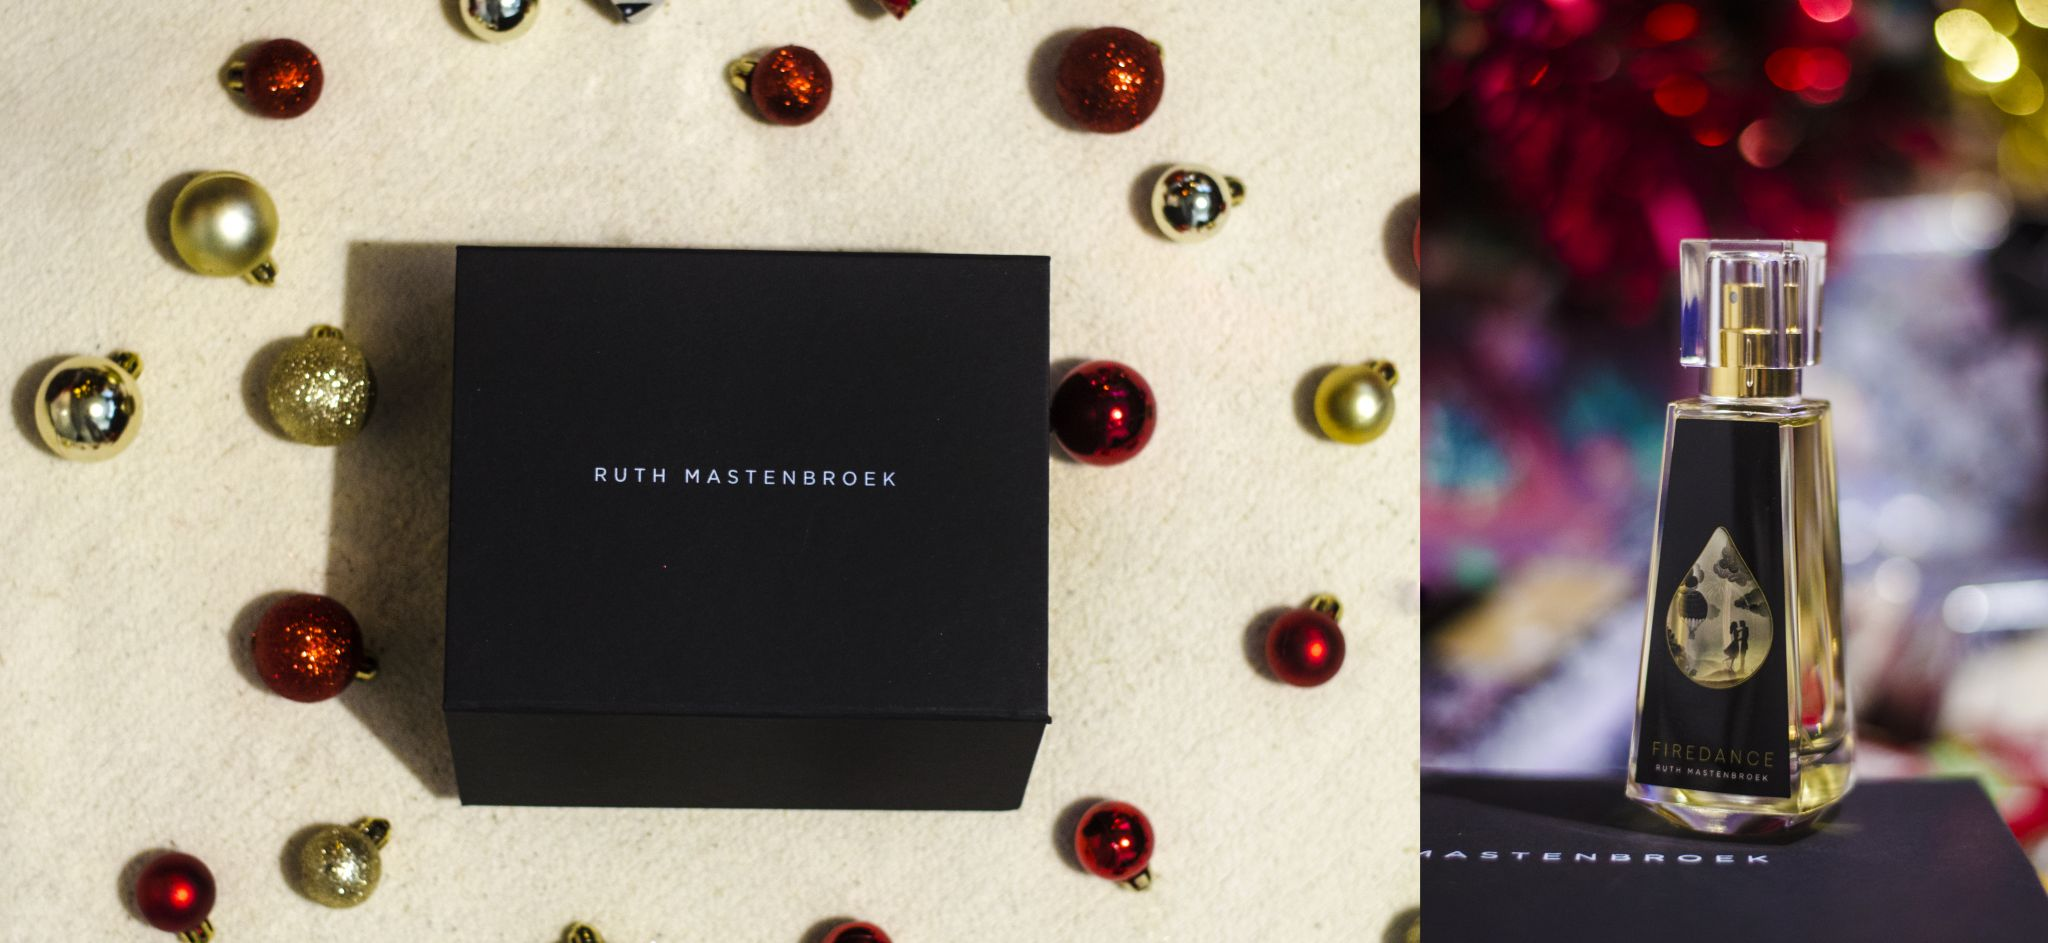 Ruth mastenbroek perfume firedance